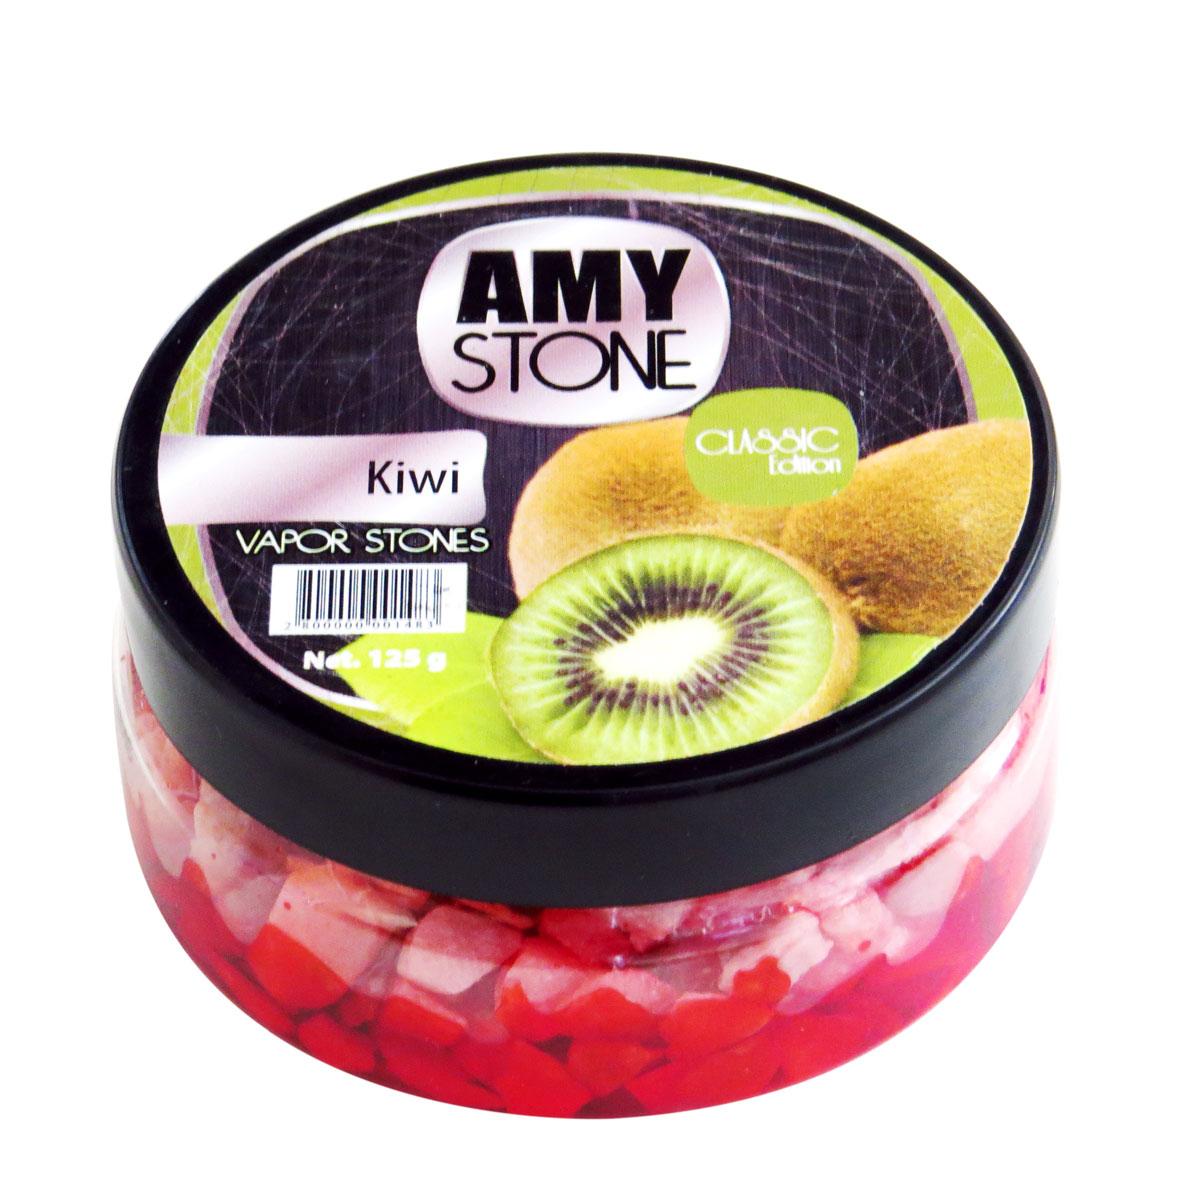 Amy Stone dampstenen - Kiwi